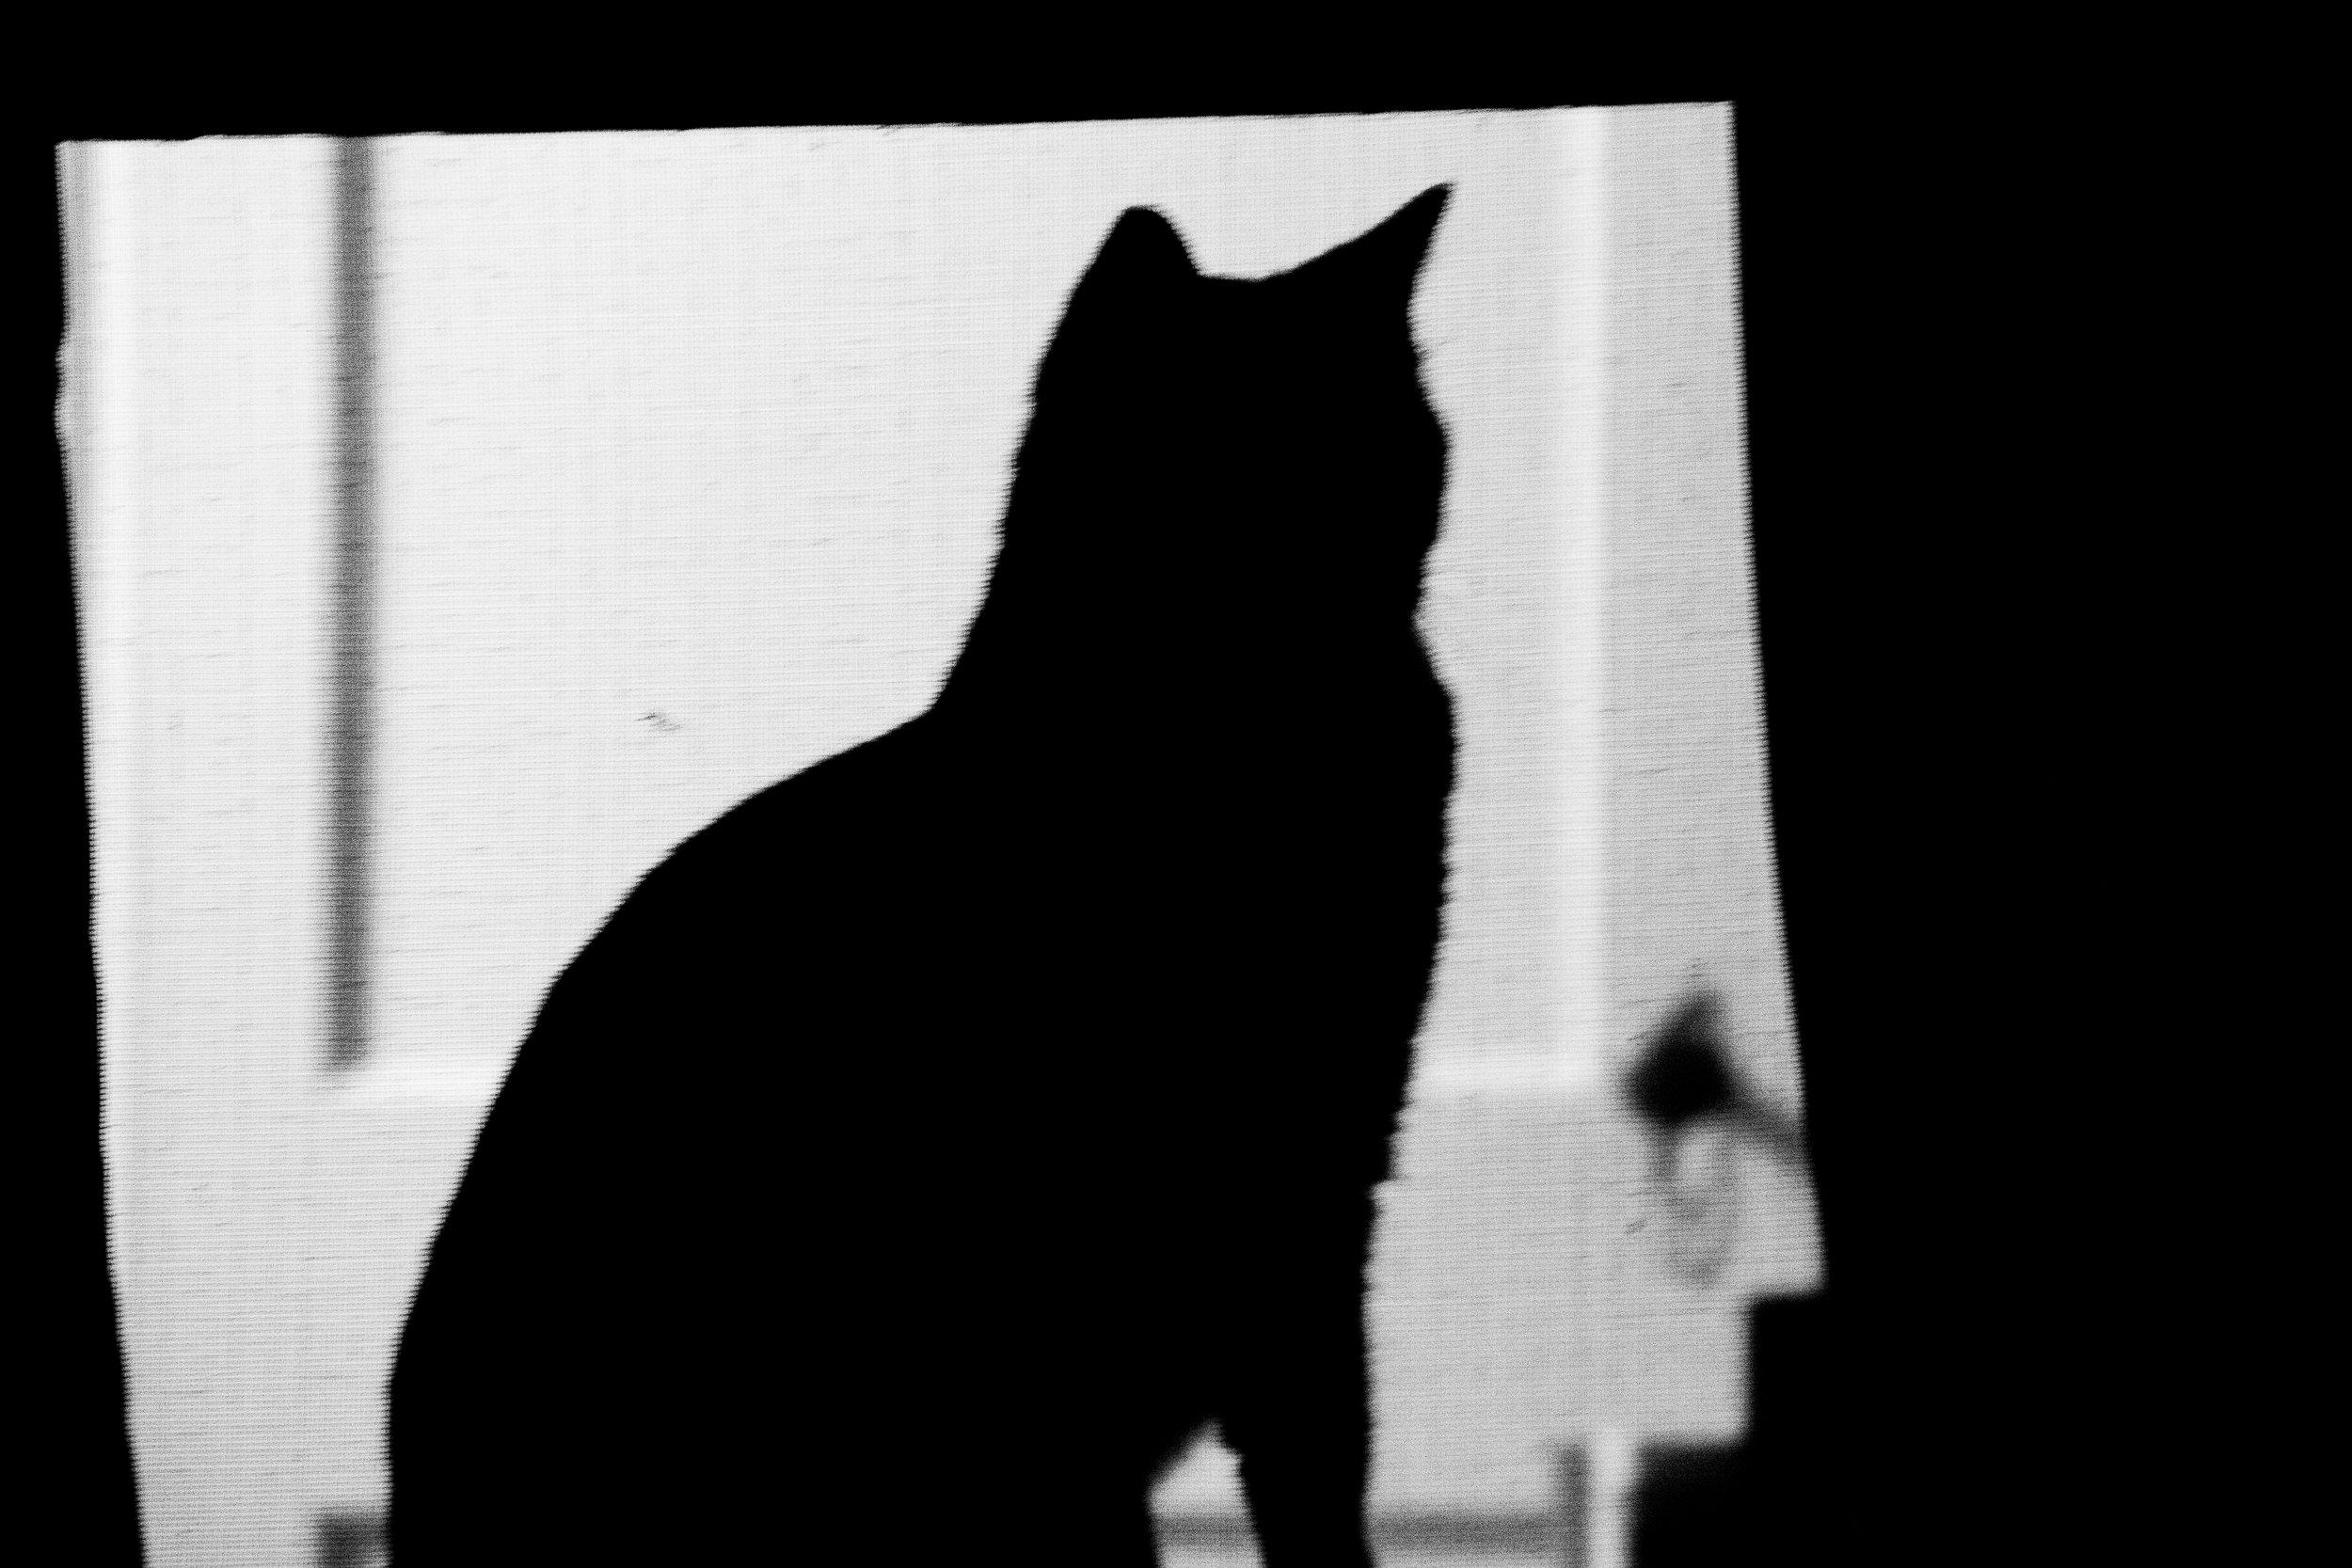 Pablito Silhouette-2.jpg